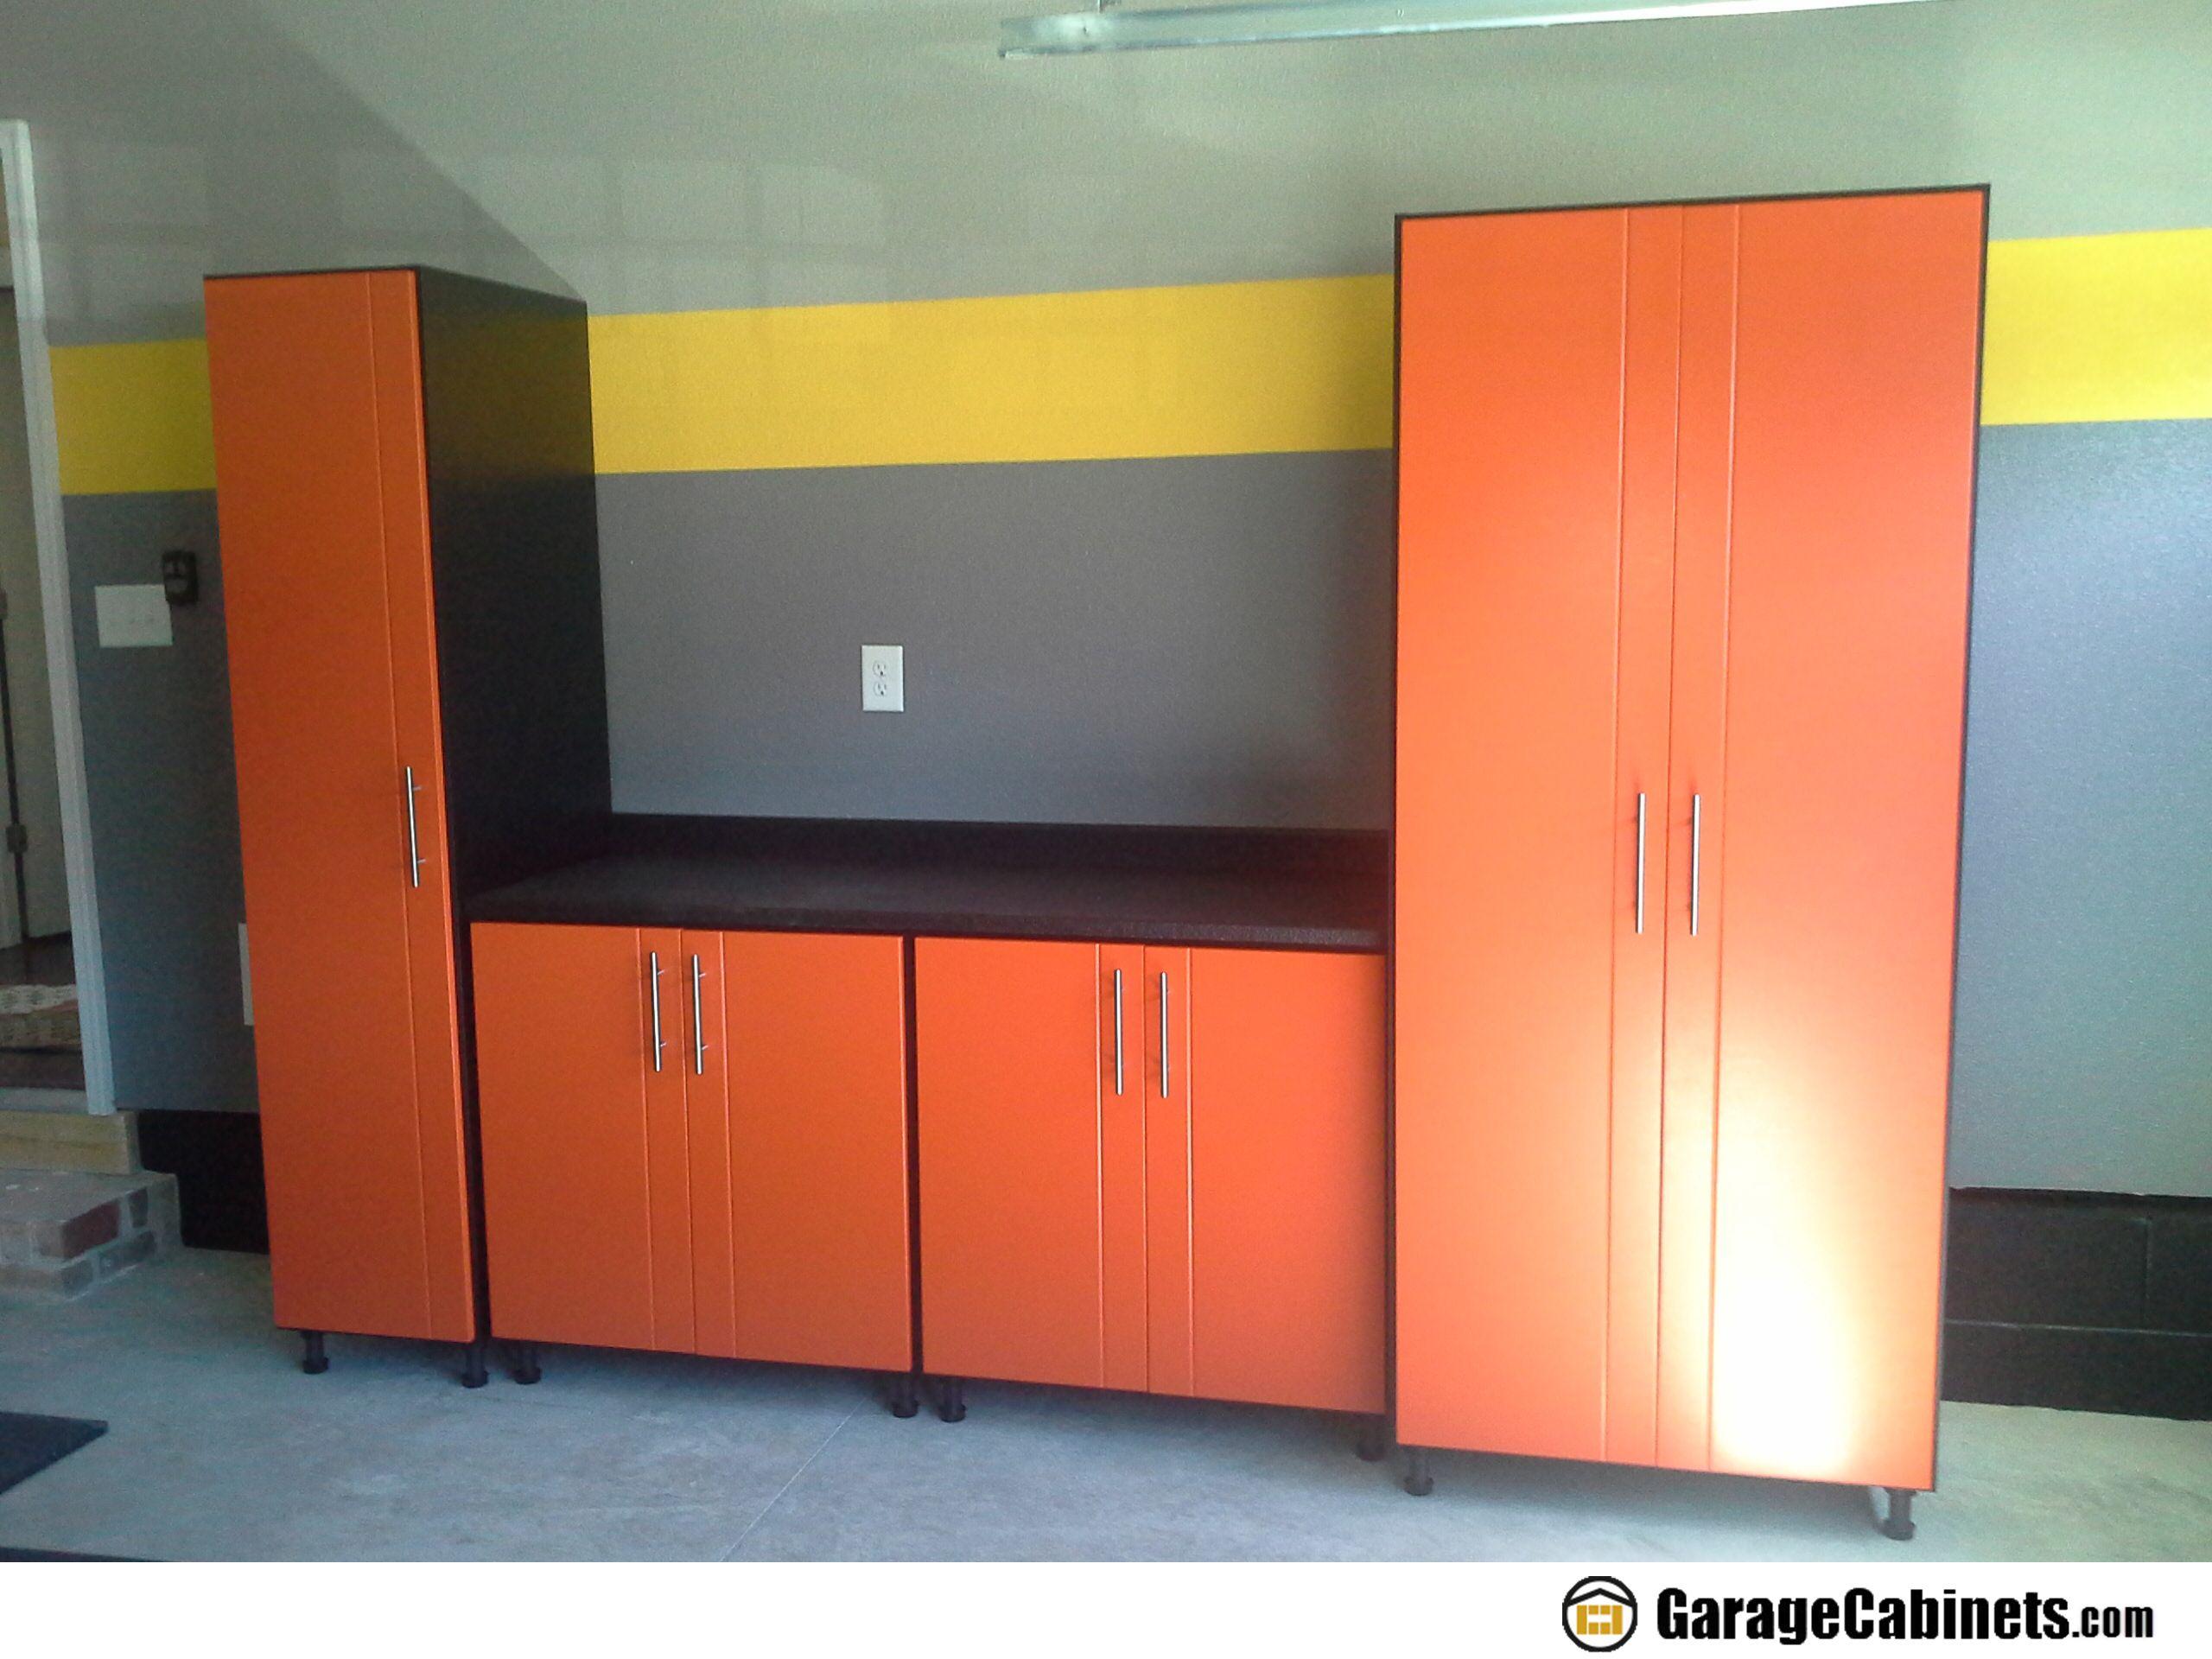 Garagecabinets Com Manufactures The Finest Garage Storage Cabinets